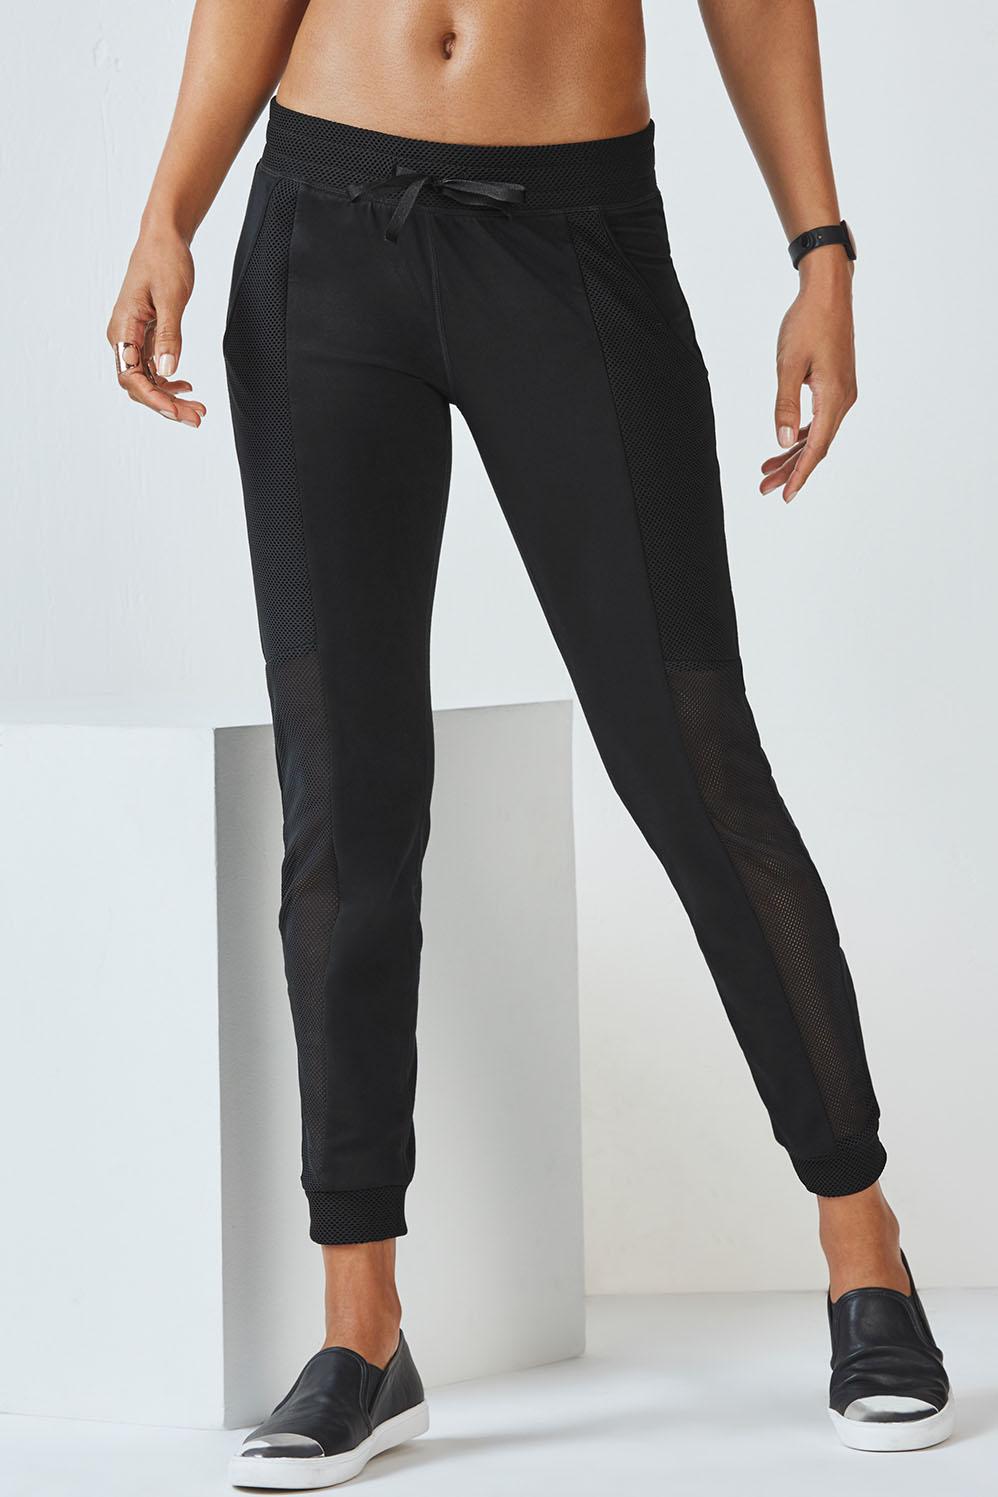 Fabletics Linda Jogger Pants Womens Black Size XXL